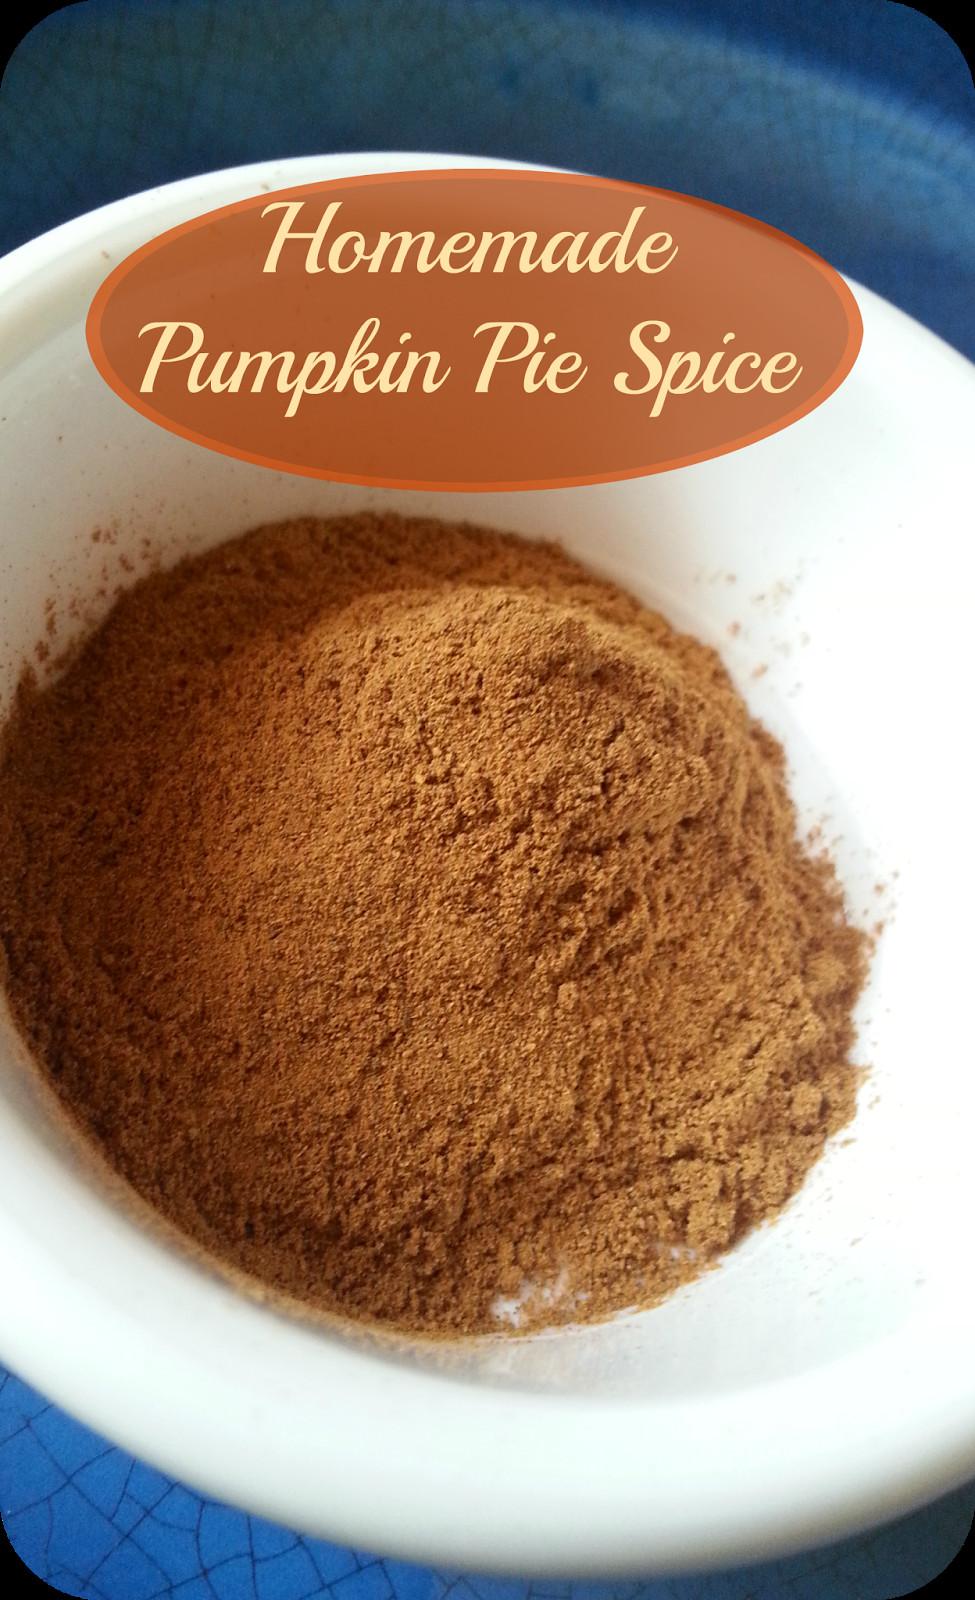 Best ideas about DIY Pumpkin Pie Spice . Save or Pin The Better Baker Homemade Pumpkin Pie Spice & Apple Pie Spice Now.